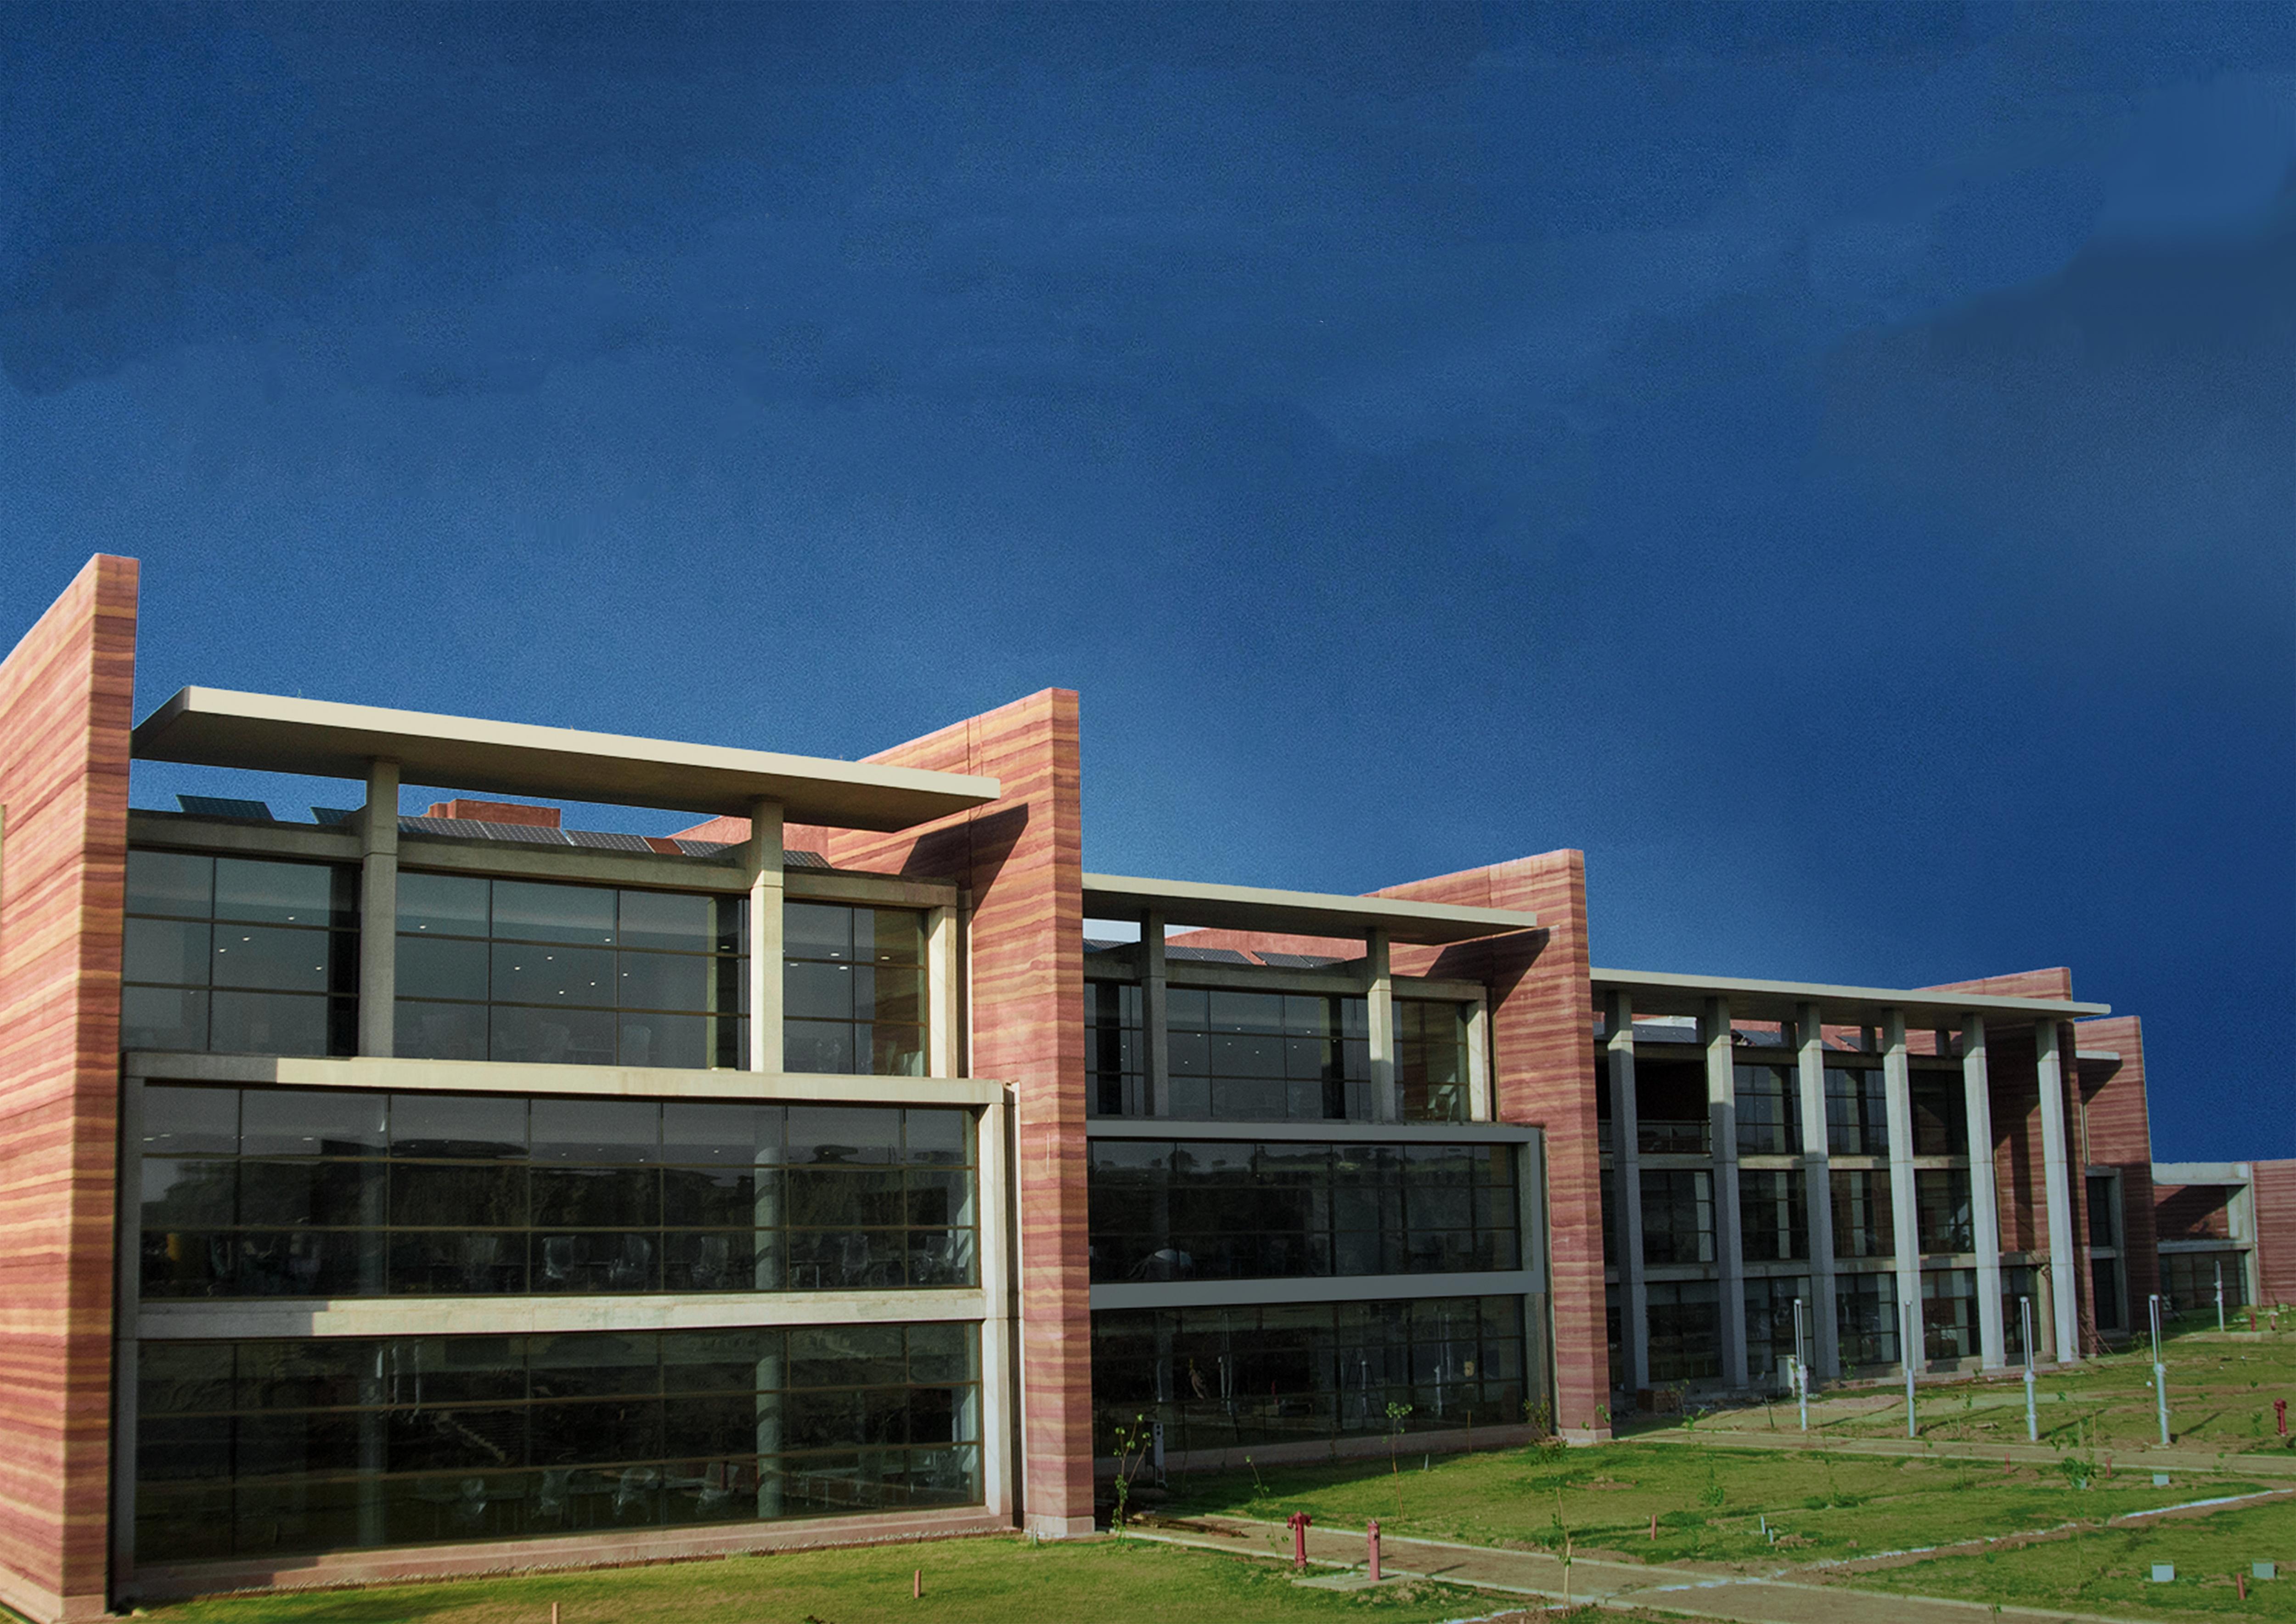 Telenor Pakistan Campus 345 receives Prestigious Leesman+ Certification